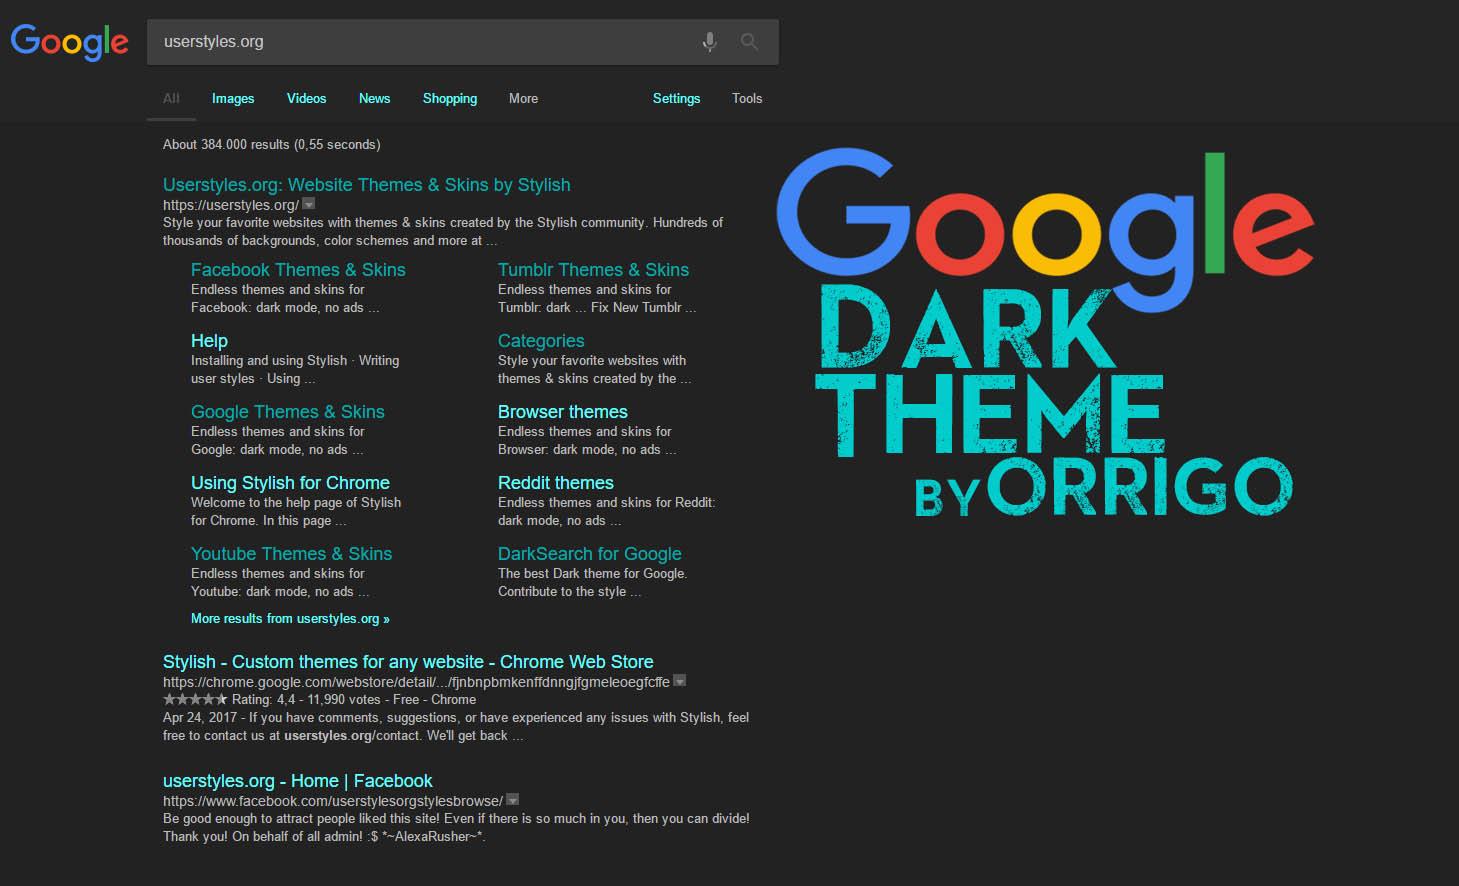 google dark theme orrigo userstyles org